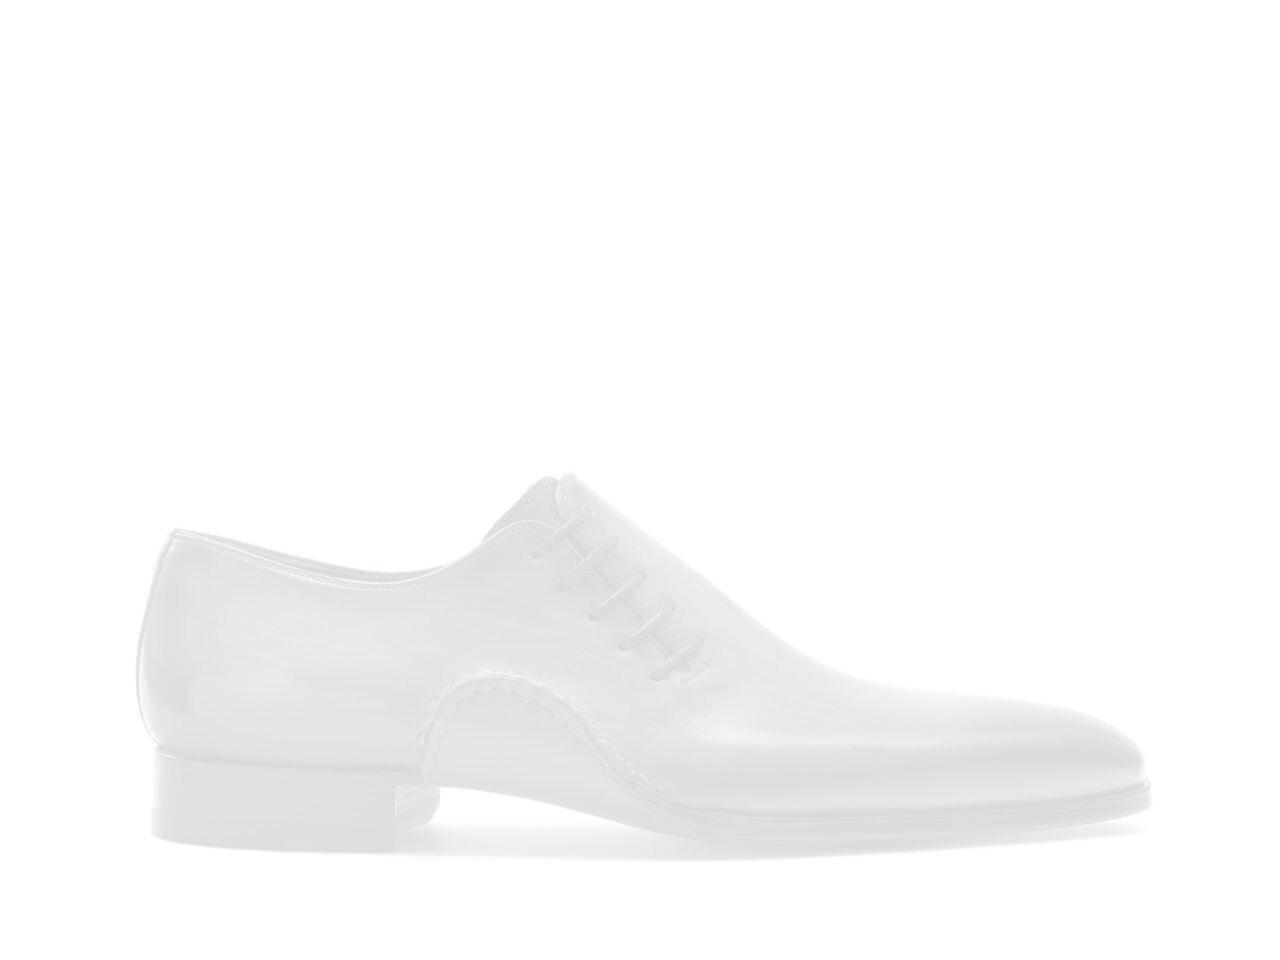 Sole of the Magnanni Herrera Black Men's Loafers